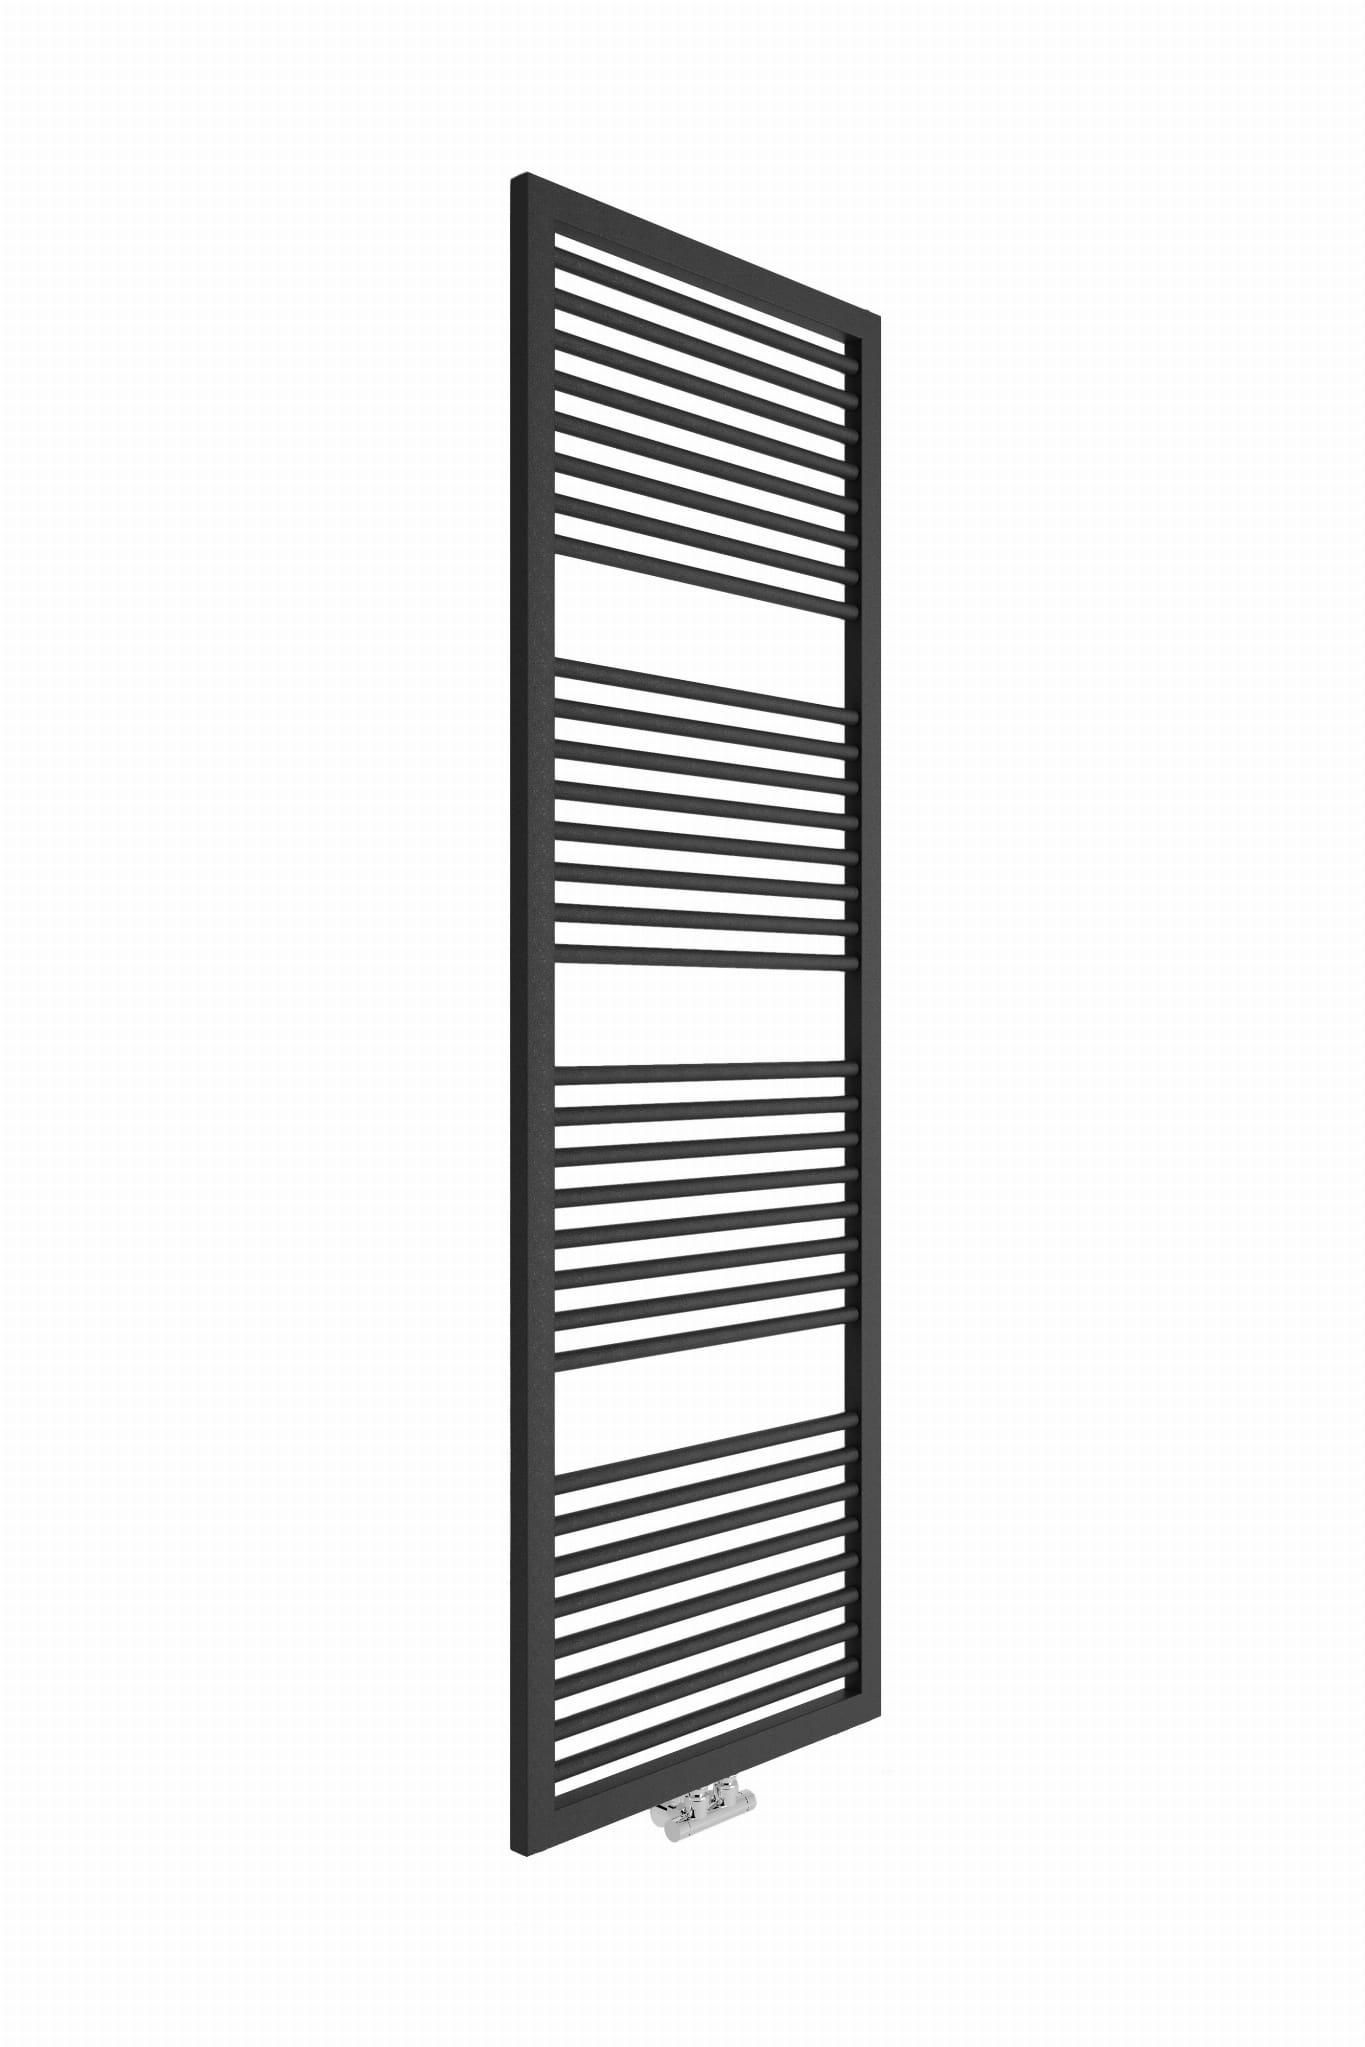 Badstuber Rimini design radiator 181.3x60cm antraciet 1007Watt